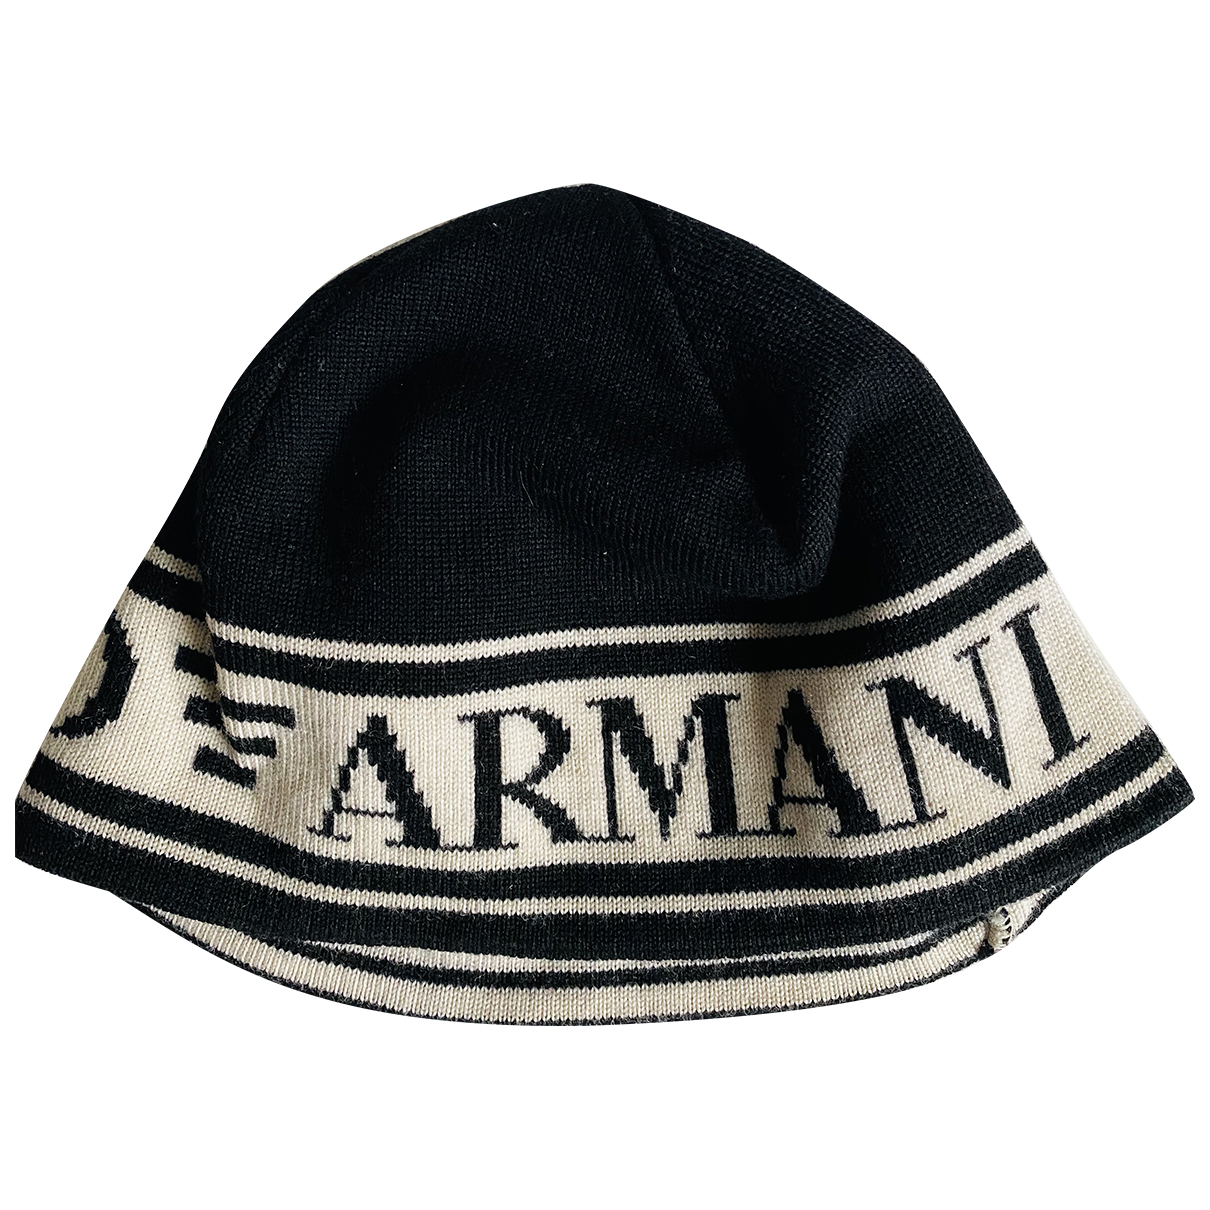 Sombrero / gorro de Lana Emporio Armani